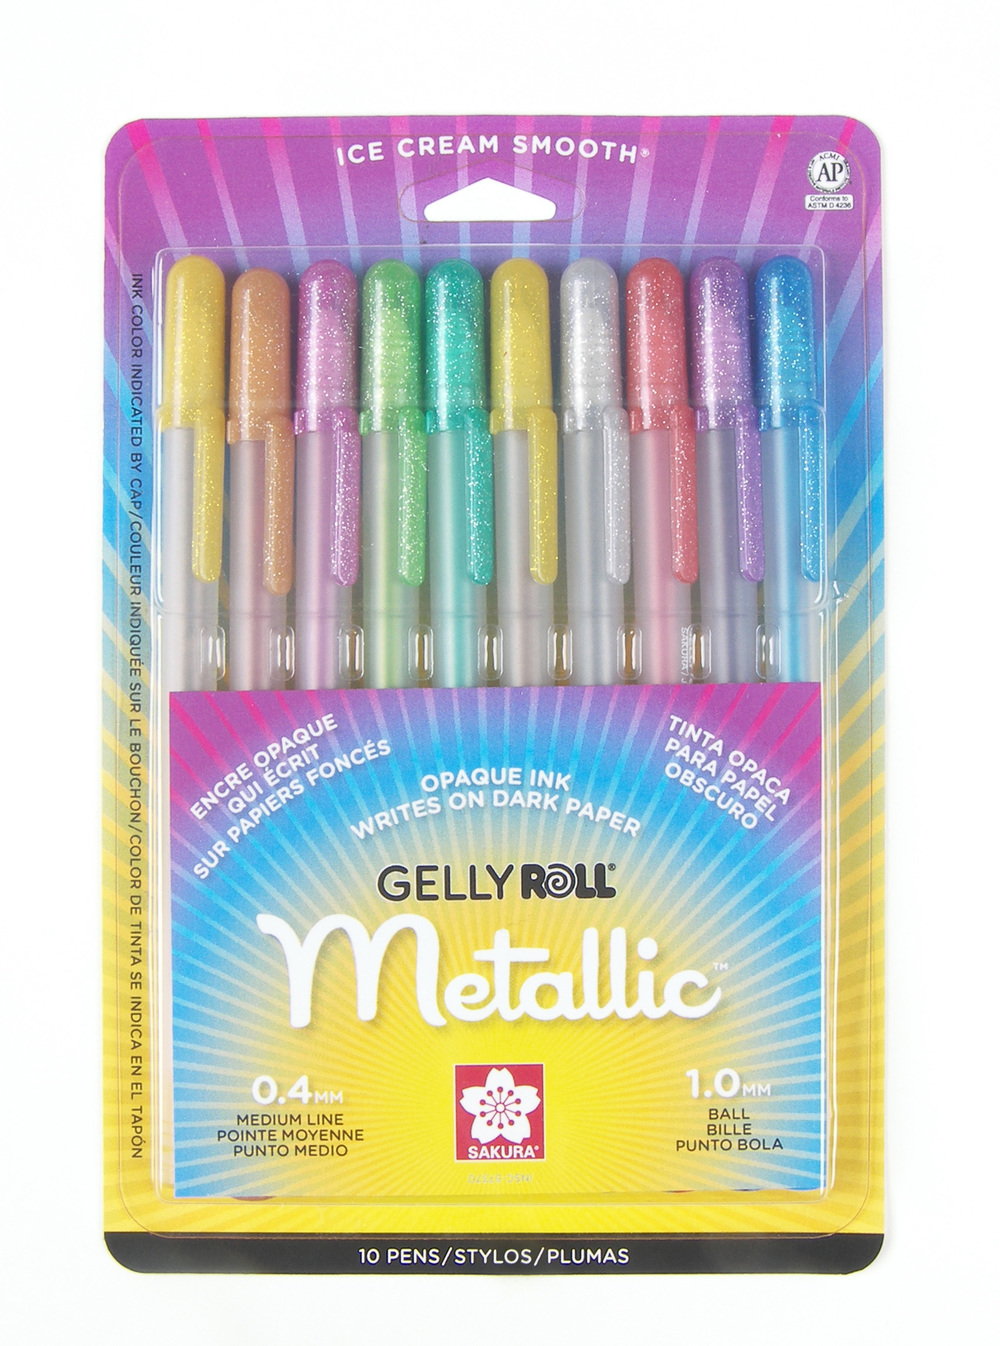 Gelly roll pens